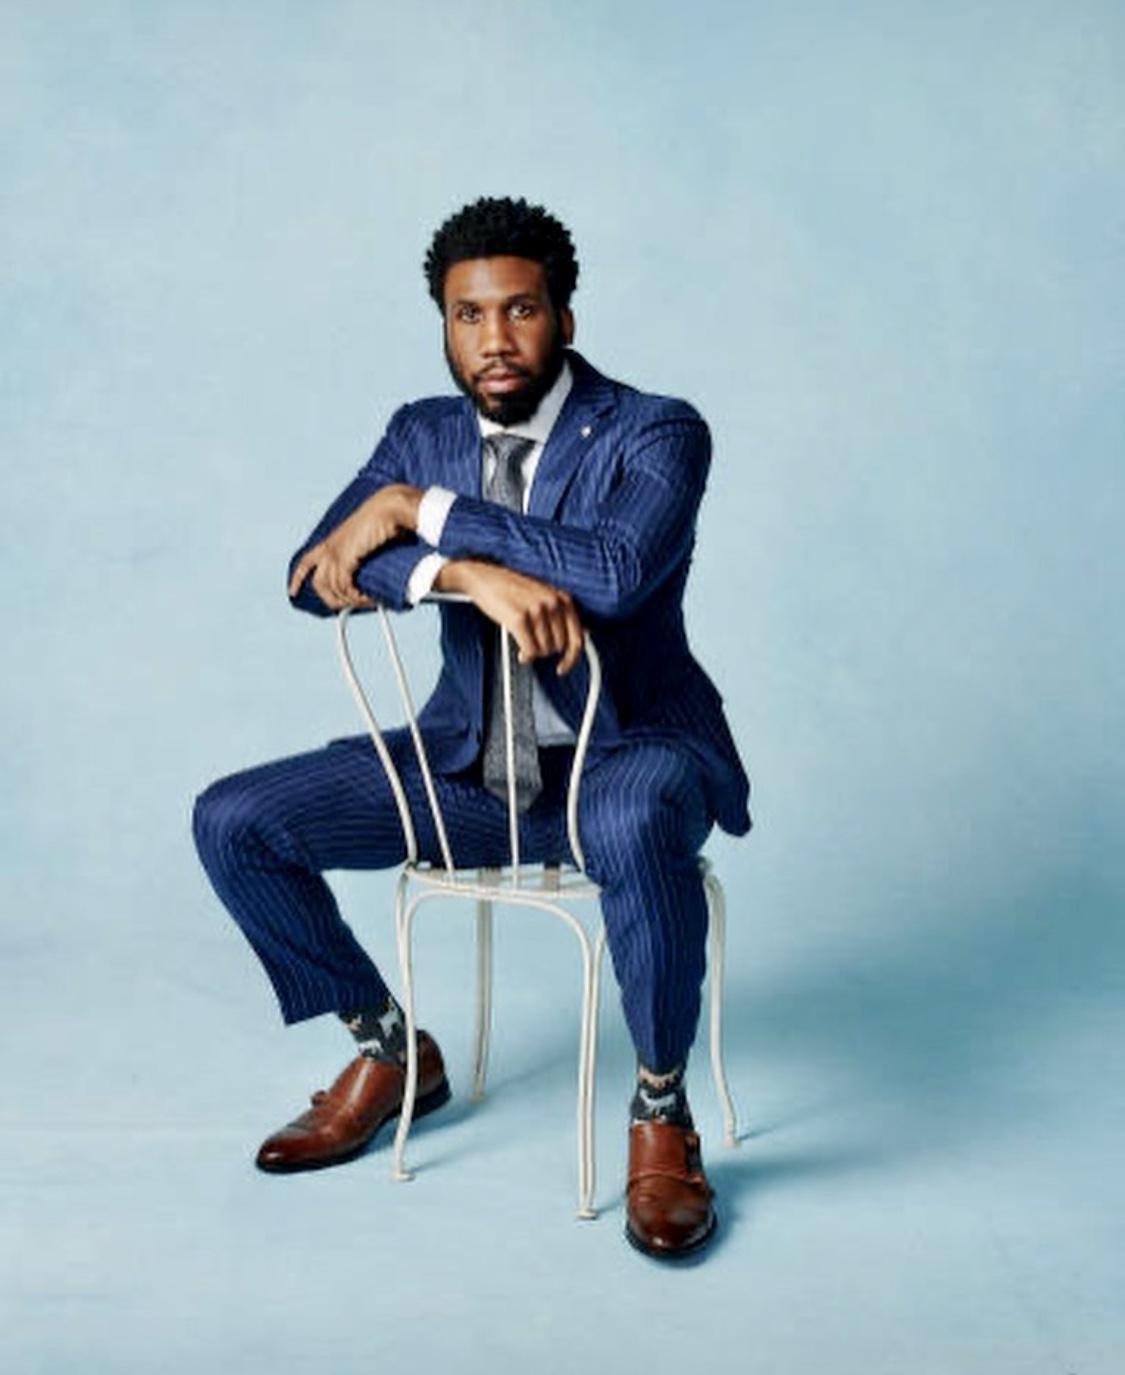 Photoshoot Stylist for Men, Los Angeles